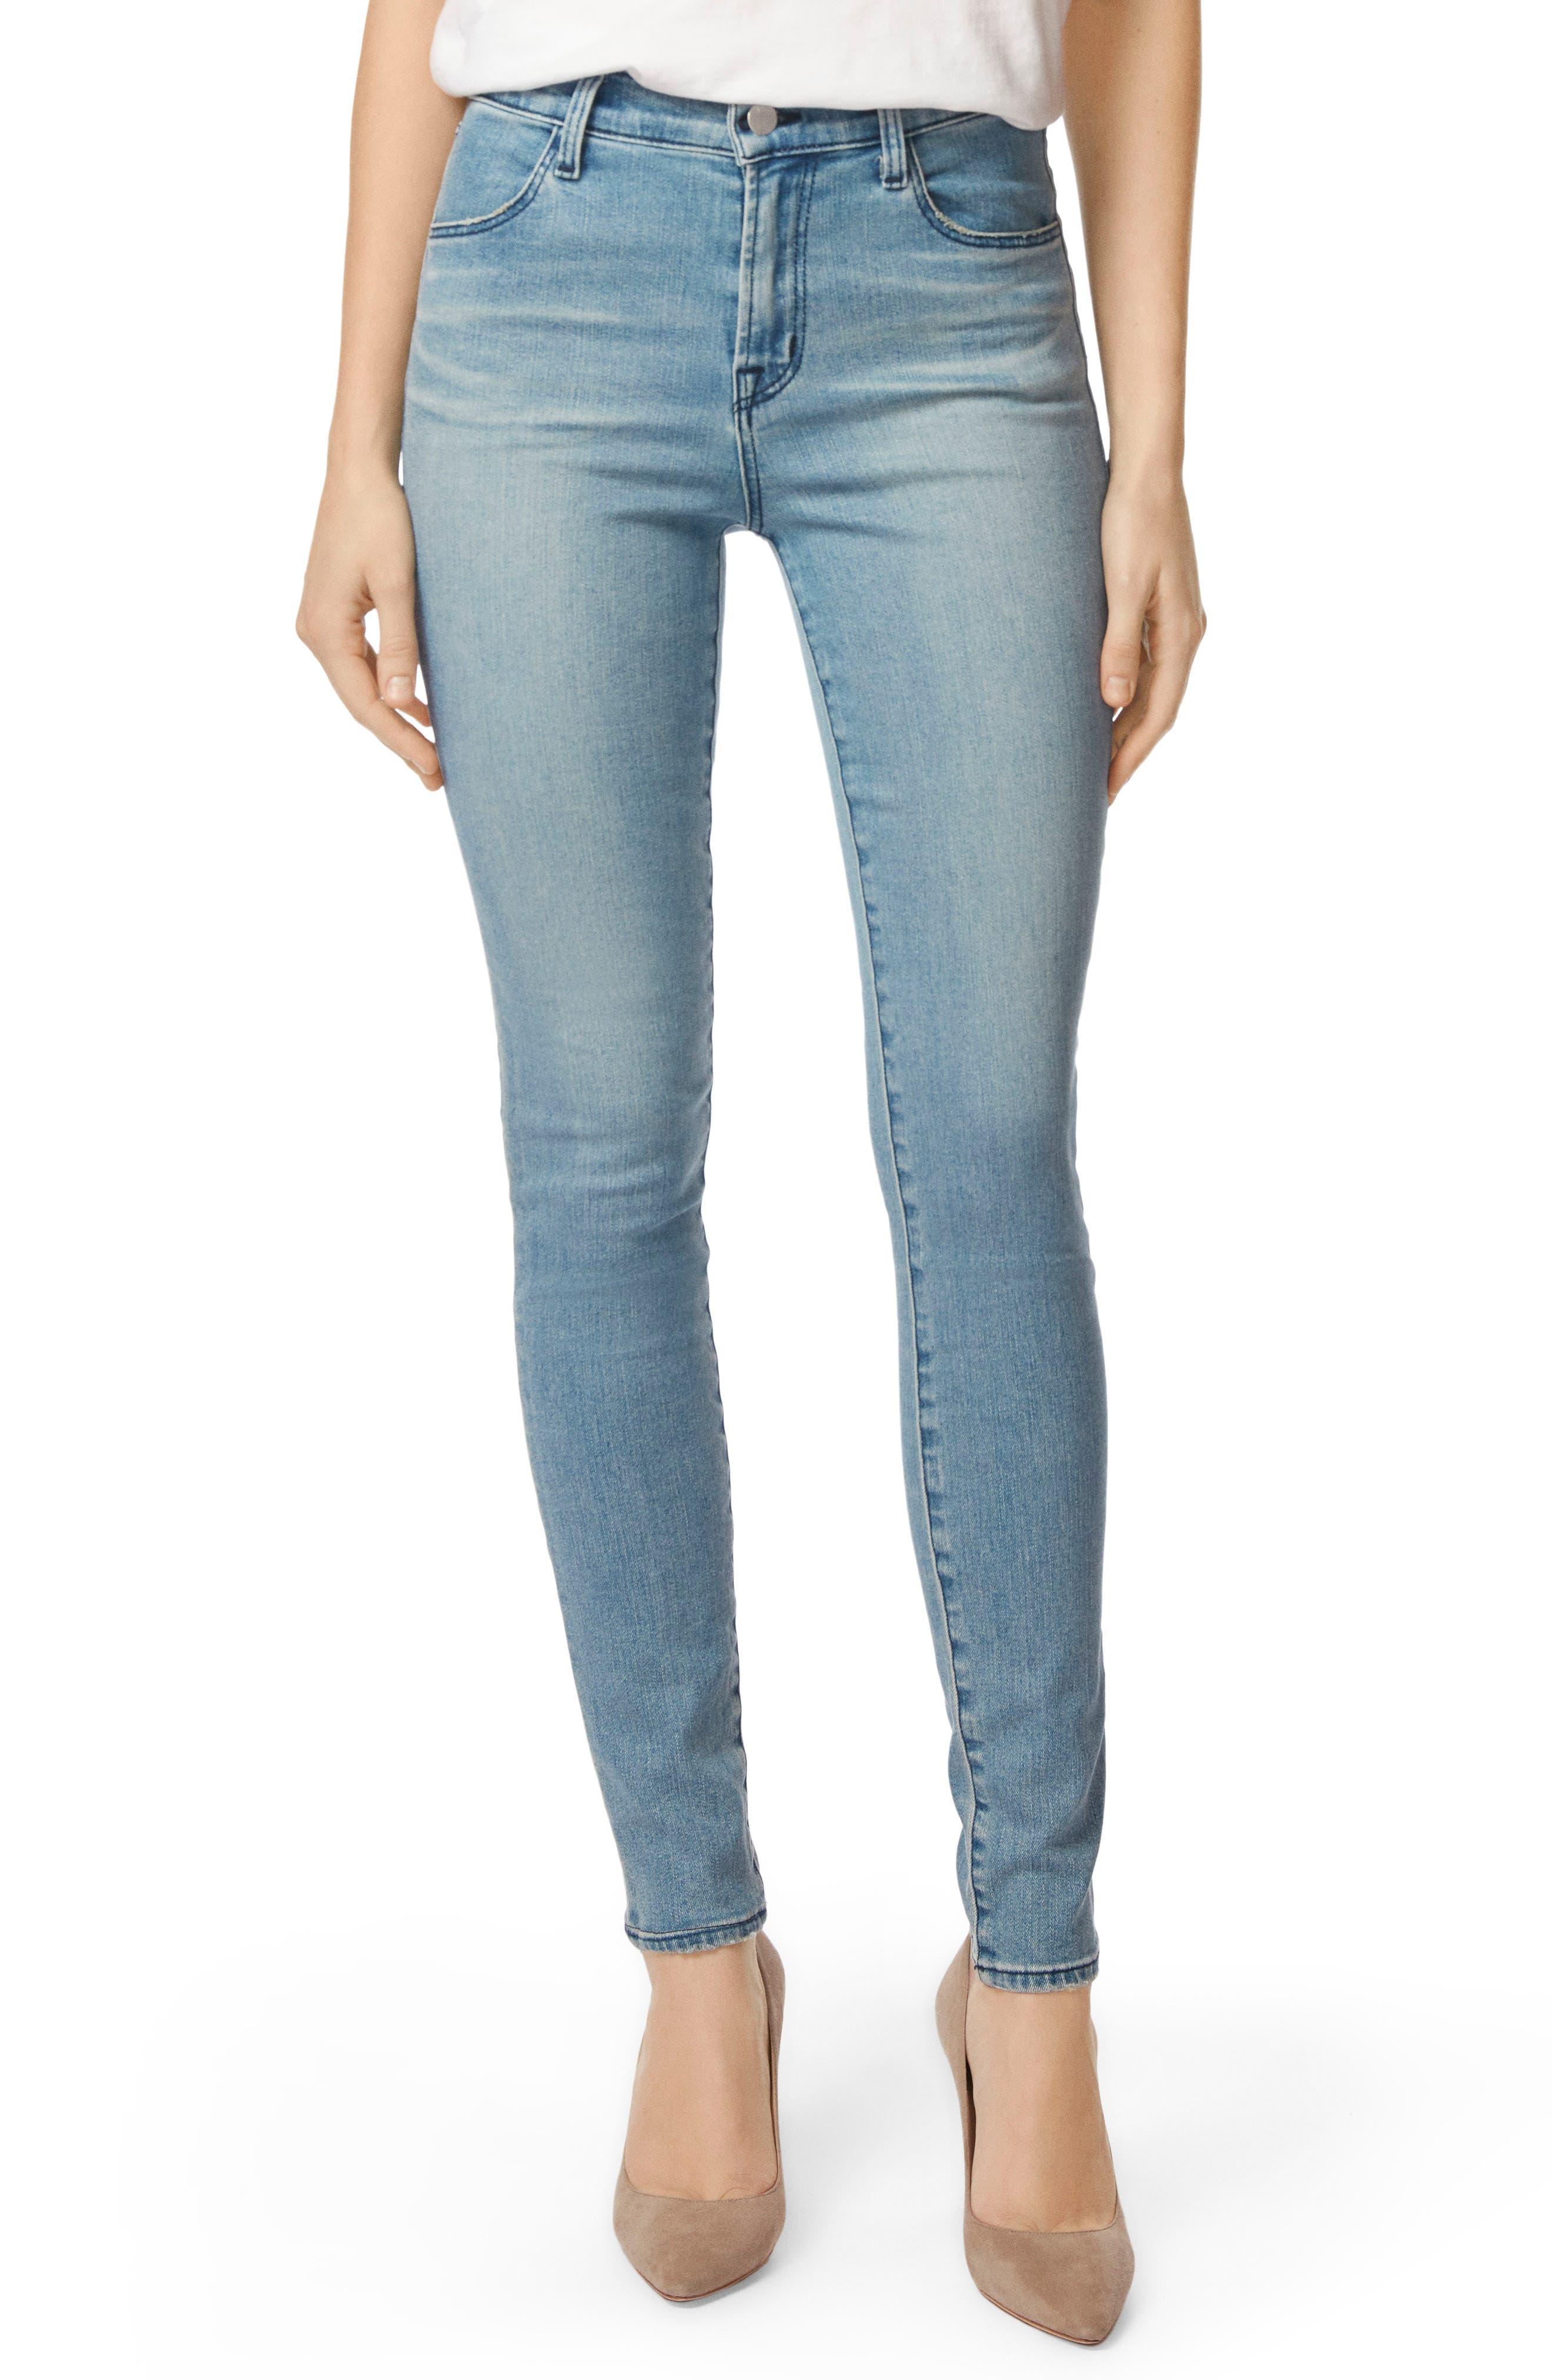 J BRAND, Maria High Waist Skinny Jeans, Main thumbnail 1, color, 407